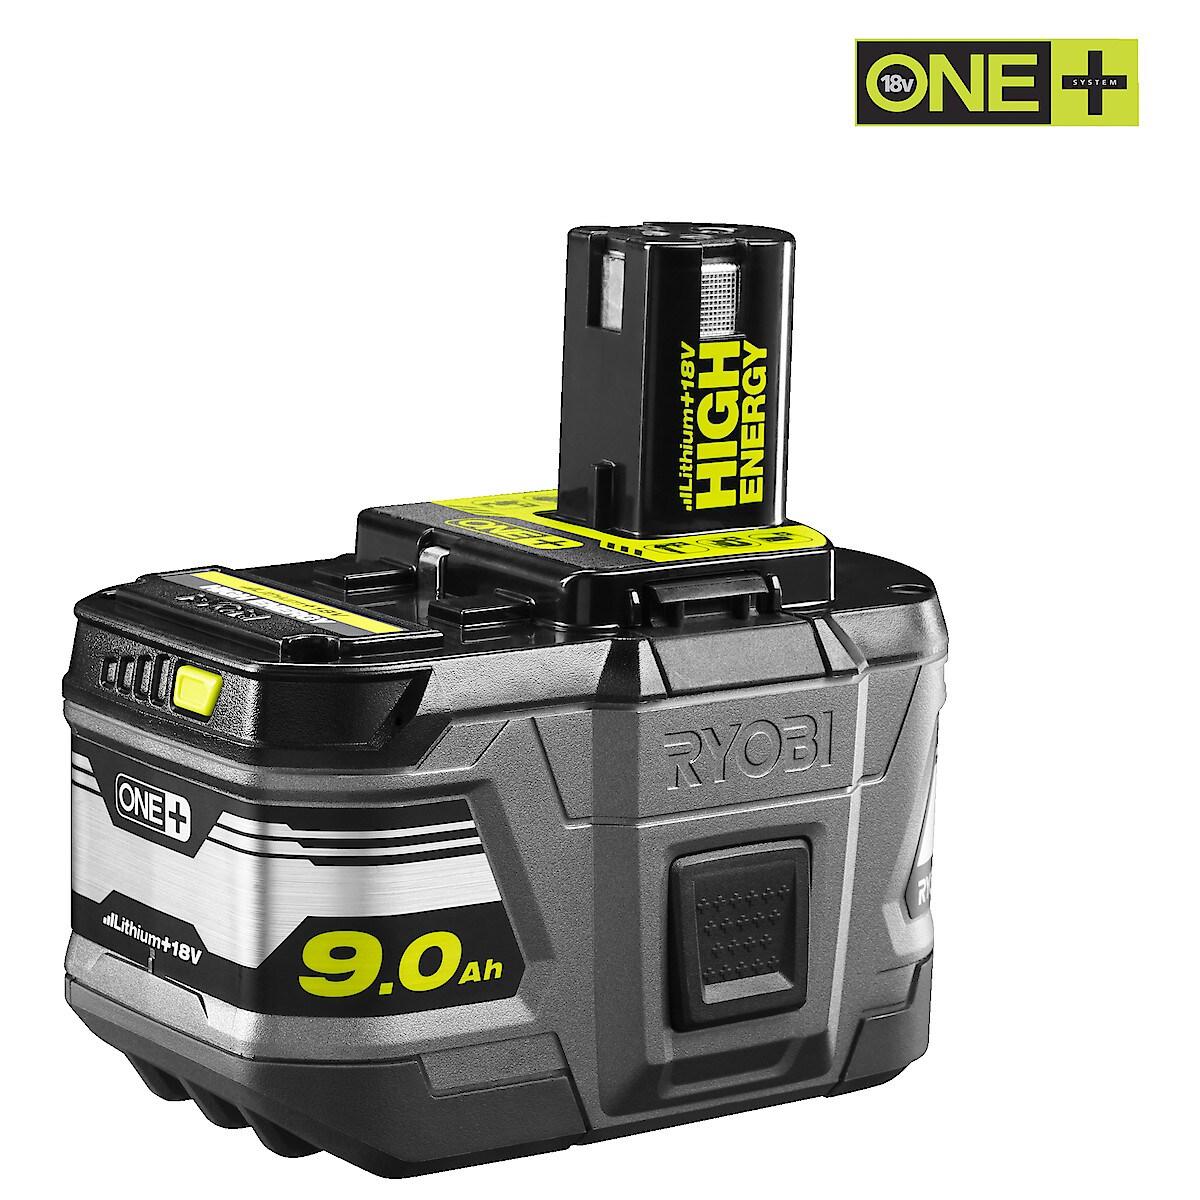 Ryobi batteri RB18L90